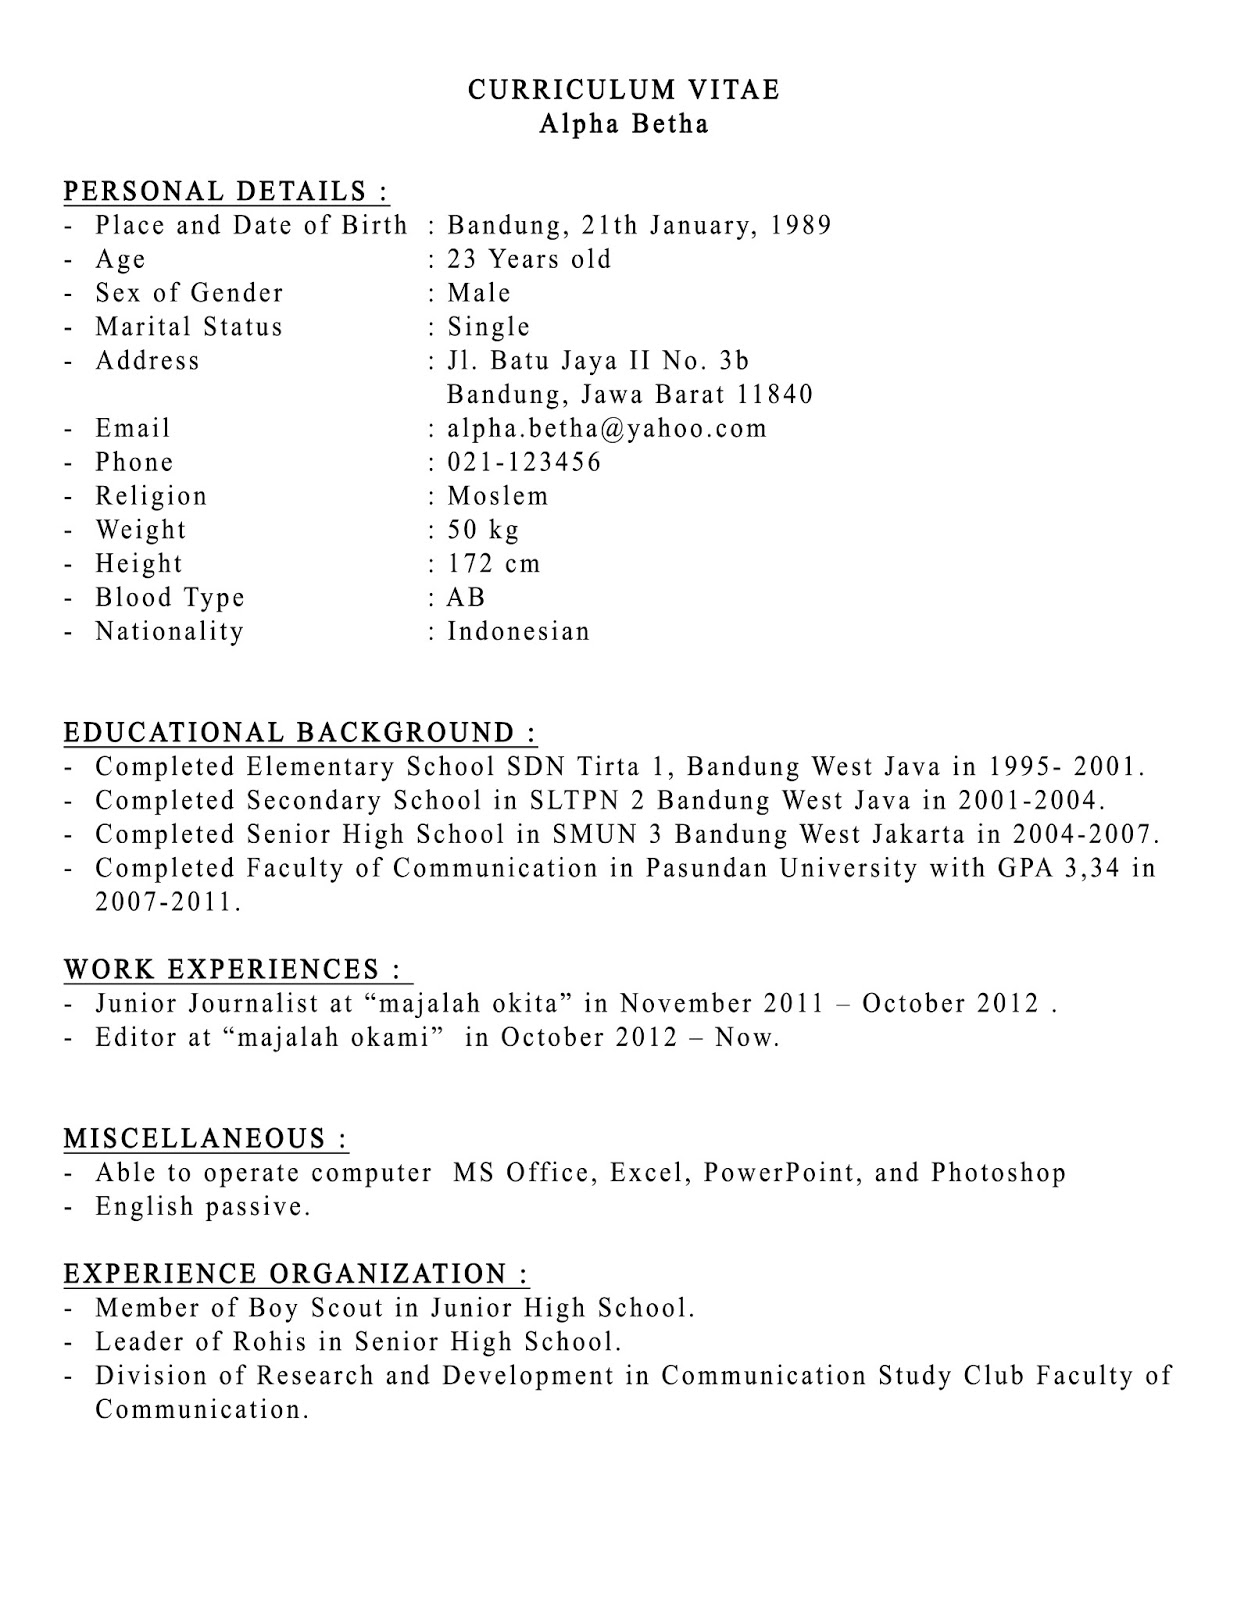 Urdu essay topics for grade 12 picture 3